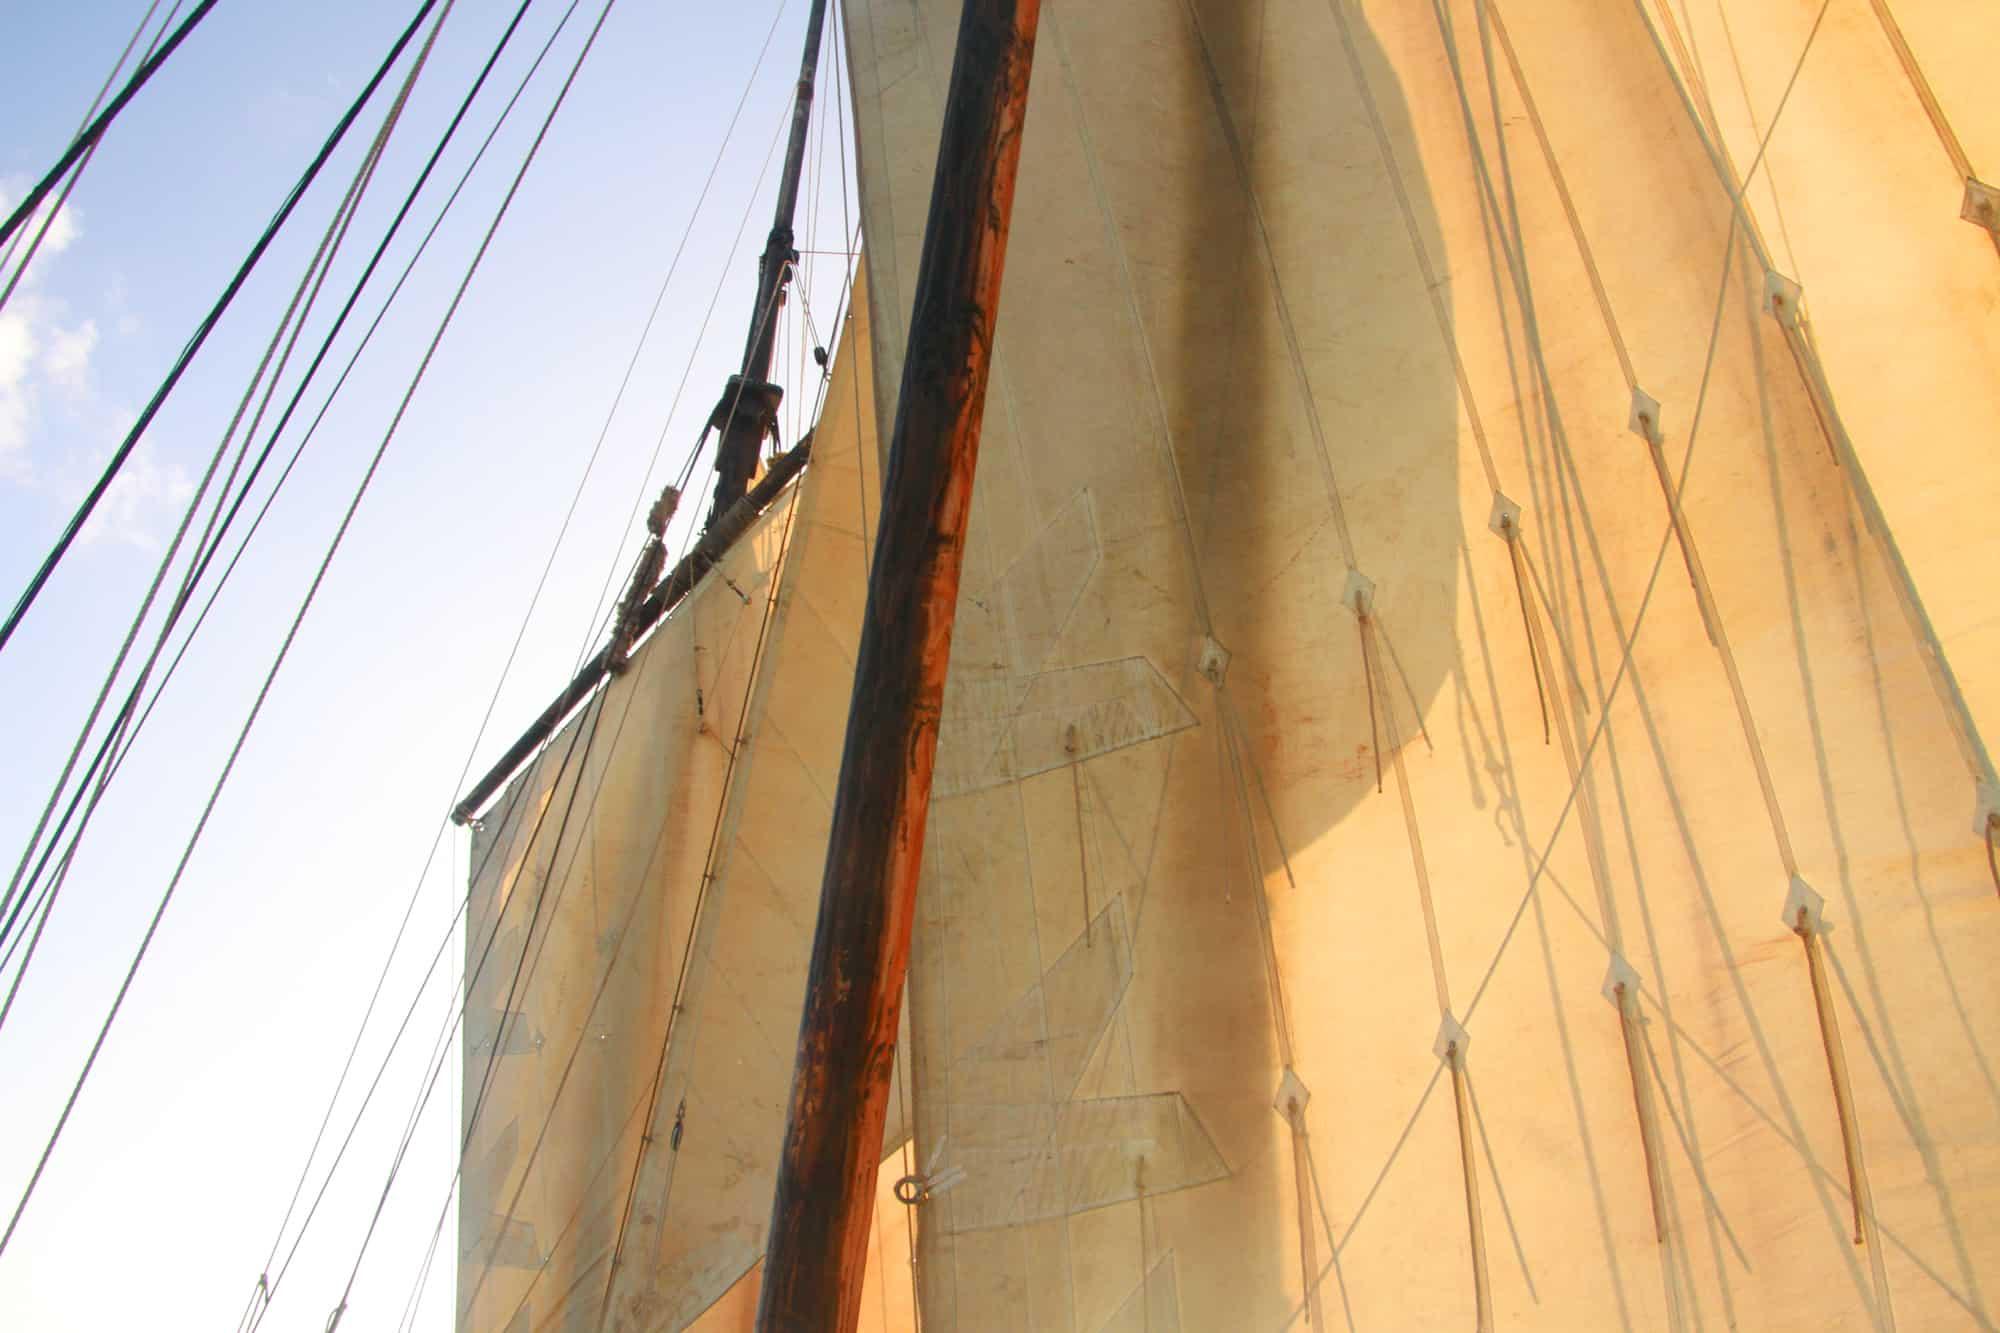 Lug sails on three masts power Grayhound across the Channel